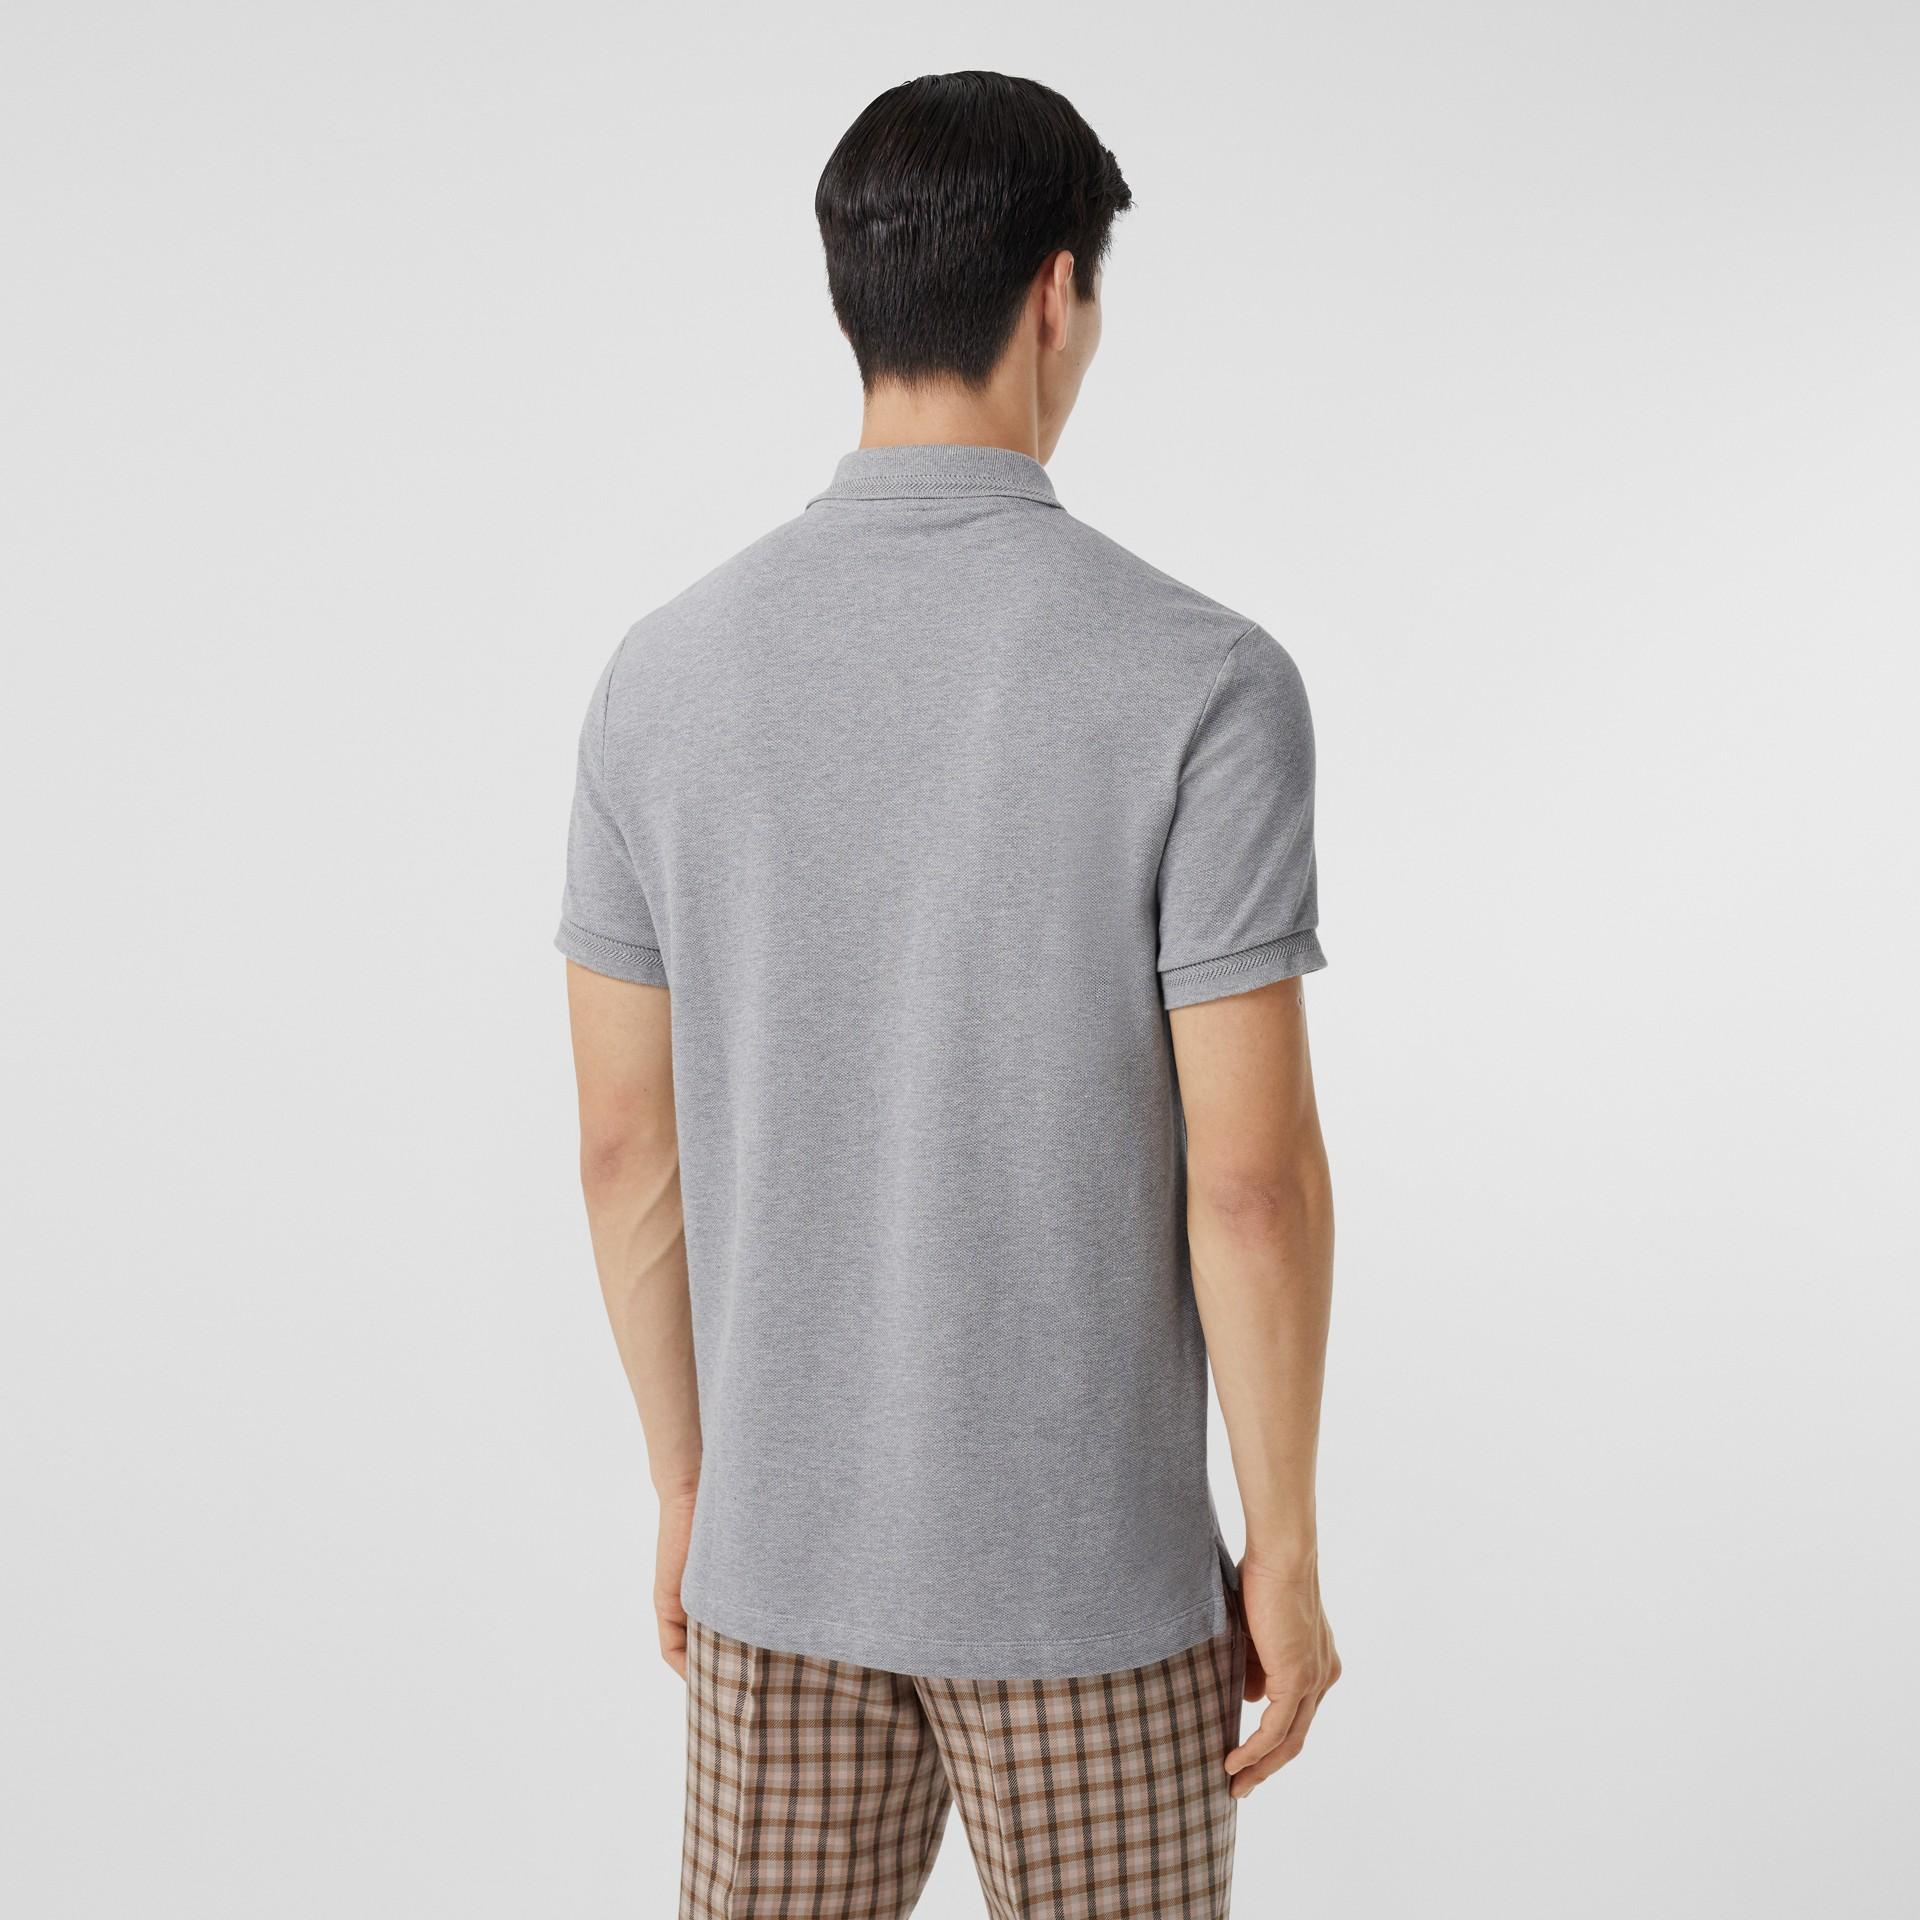 Button Detail Cotton Piqué Polo Shirt in Pale Grey Melange - Men | Burberry - gallery image 2